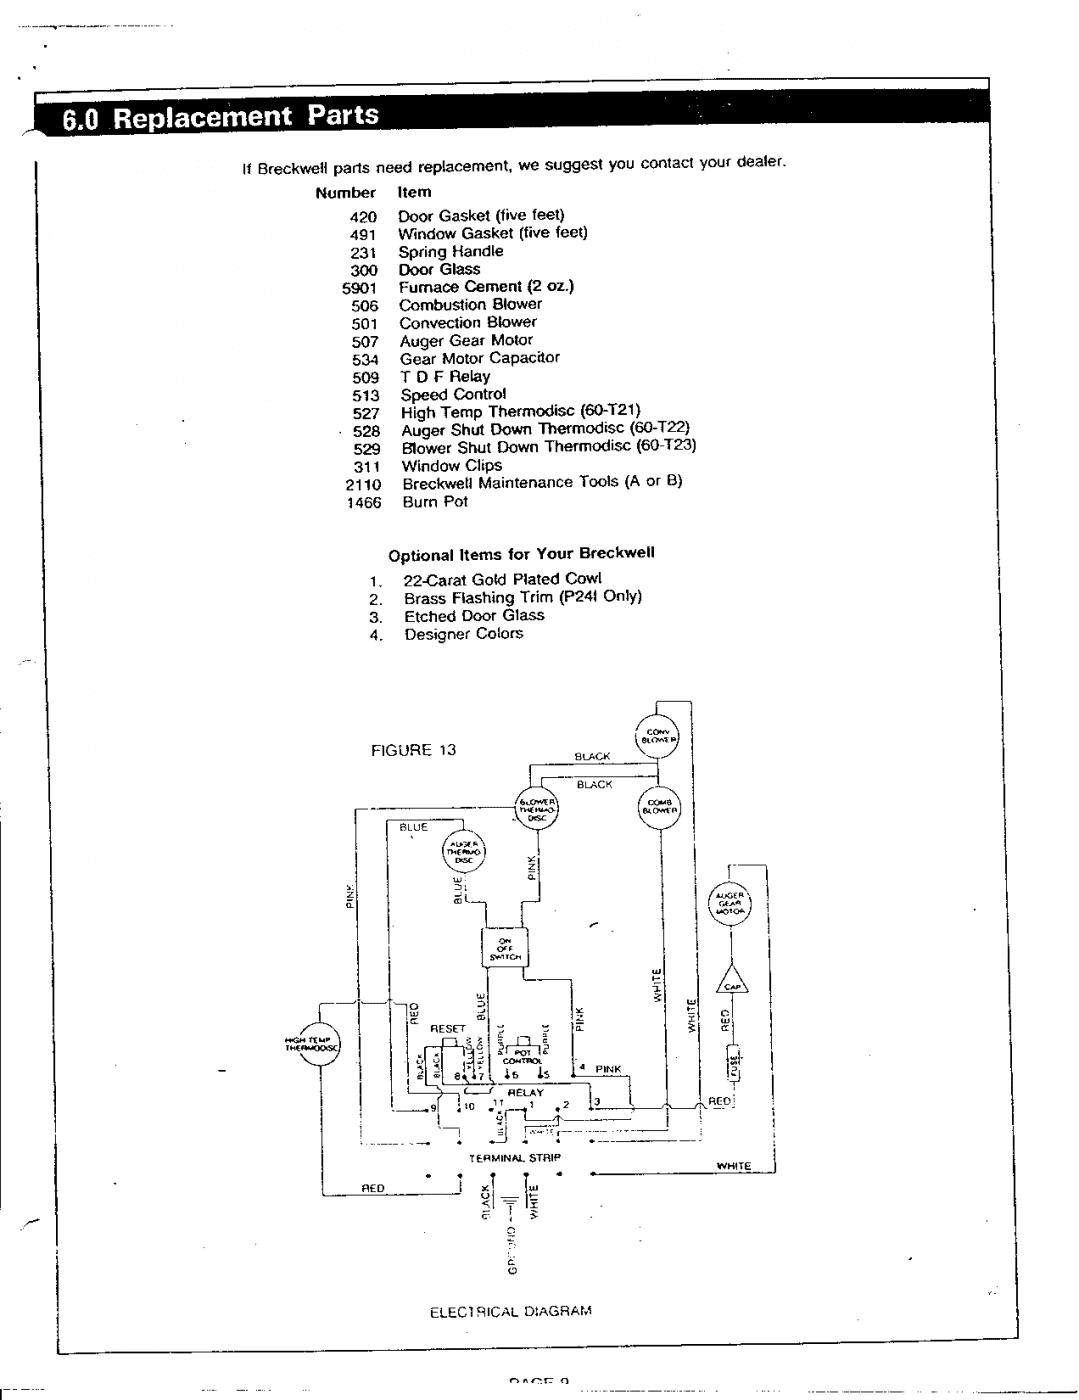 Wiring Diagrams • aneh.co